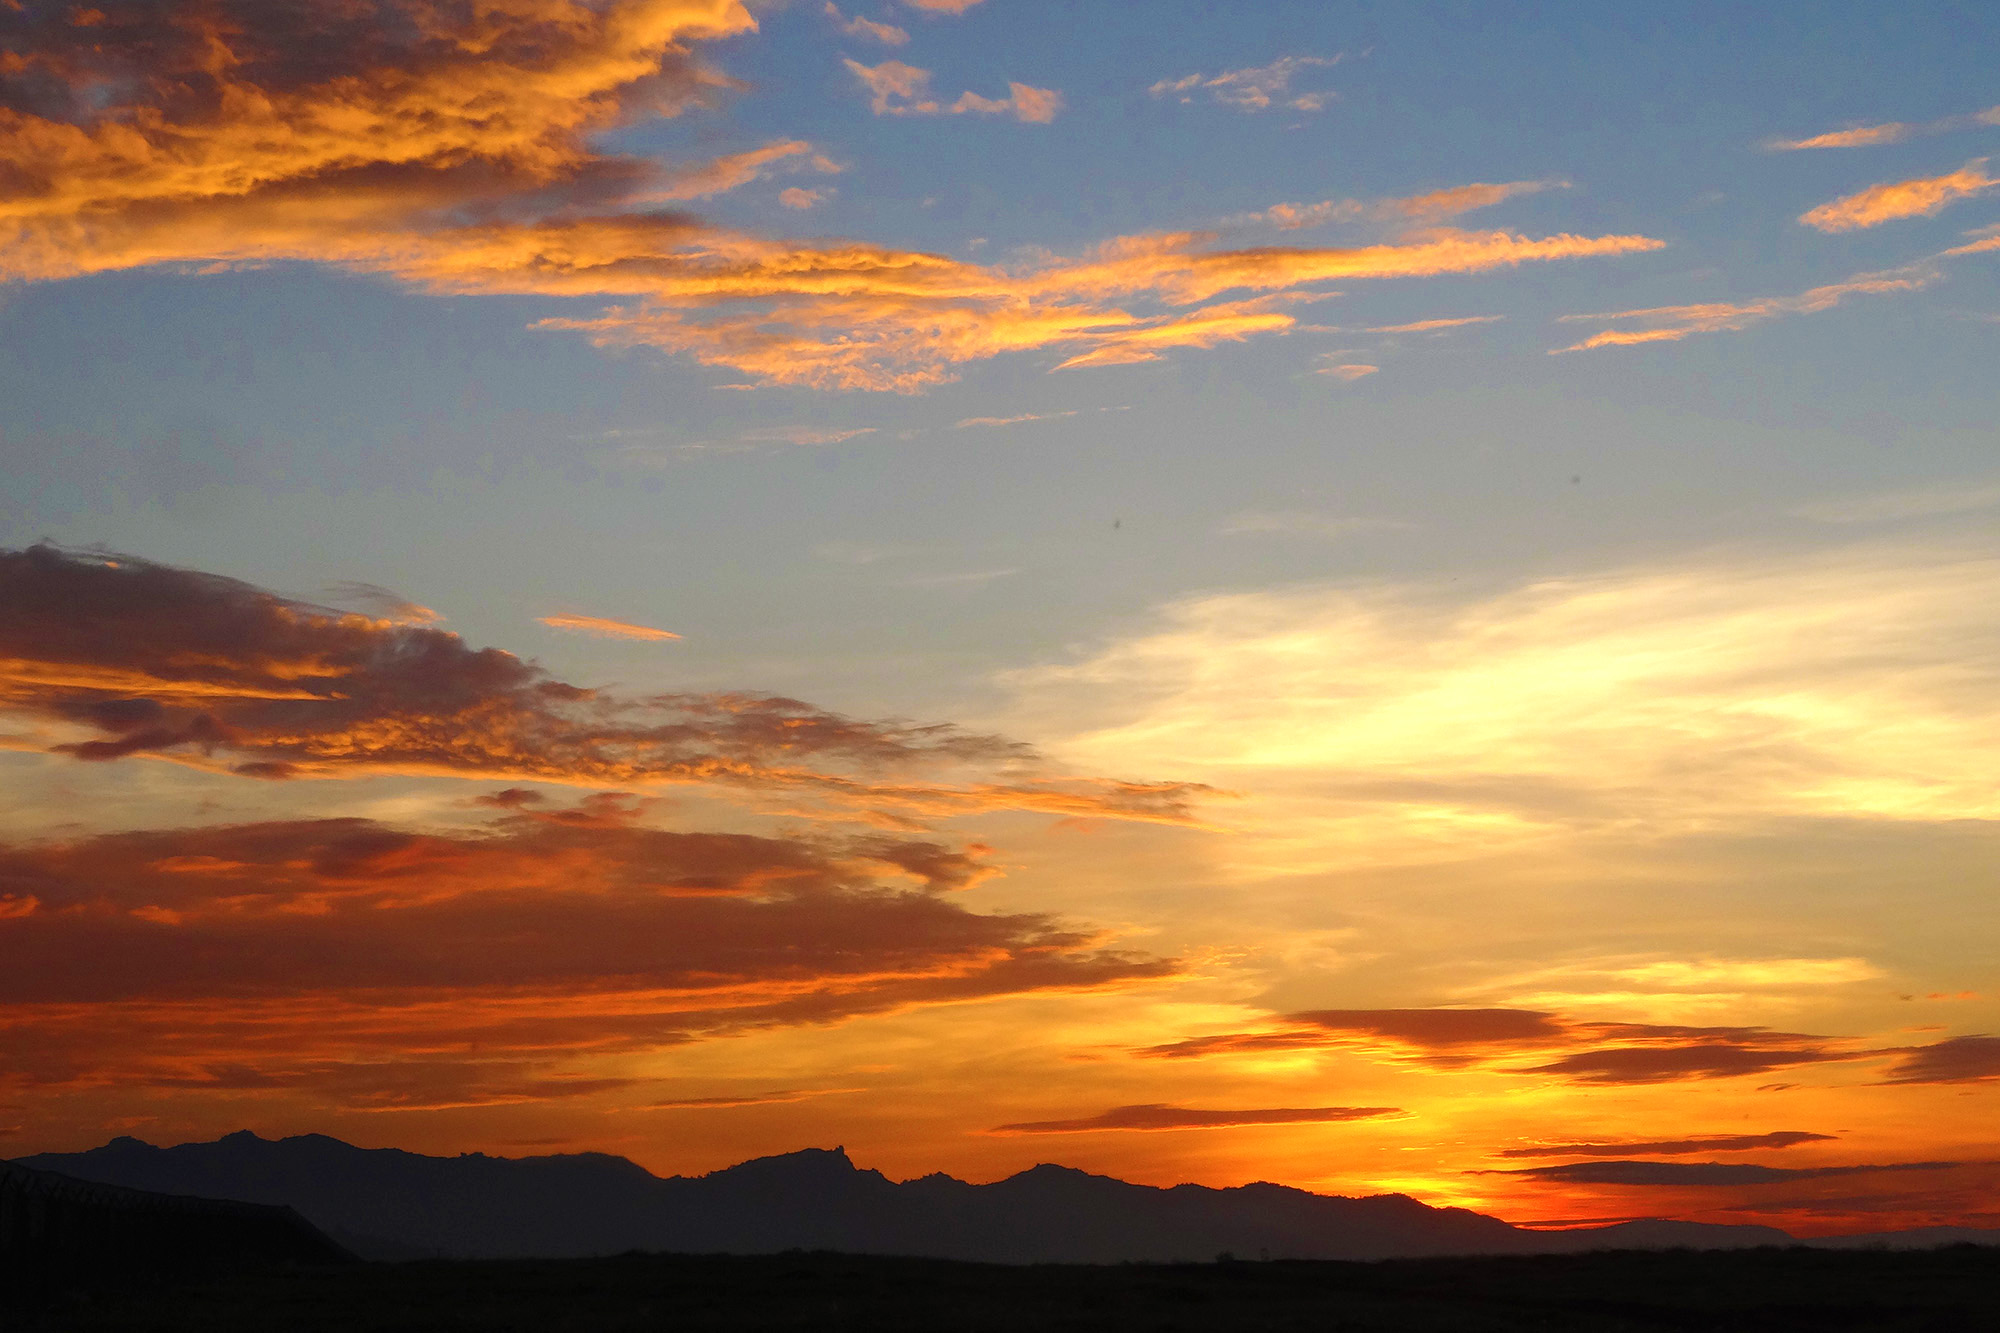 Sunset Kenya.jpg